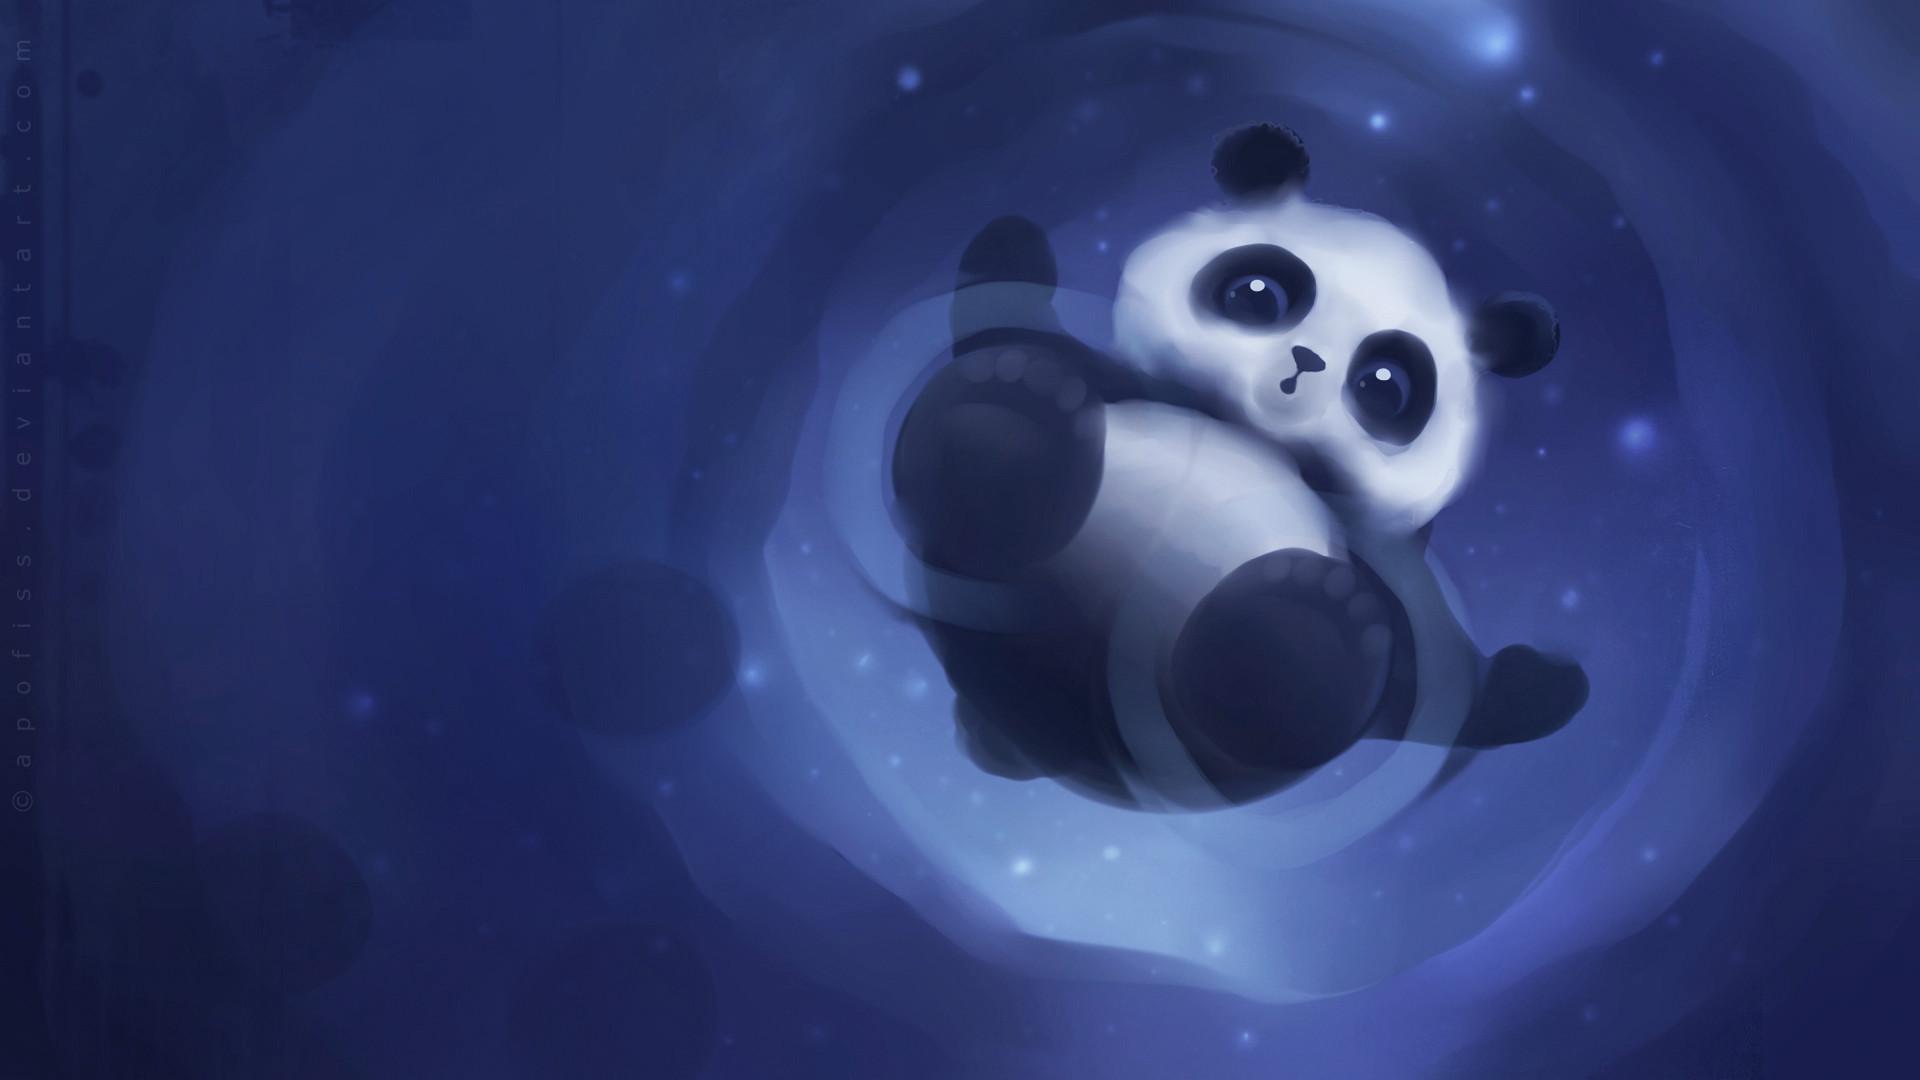 Anime Panda Wallpaper Picture